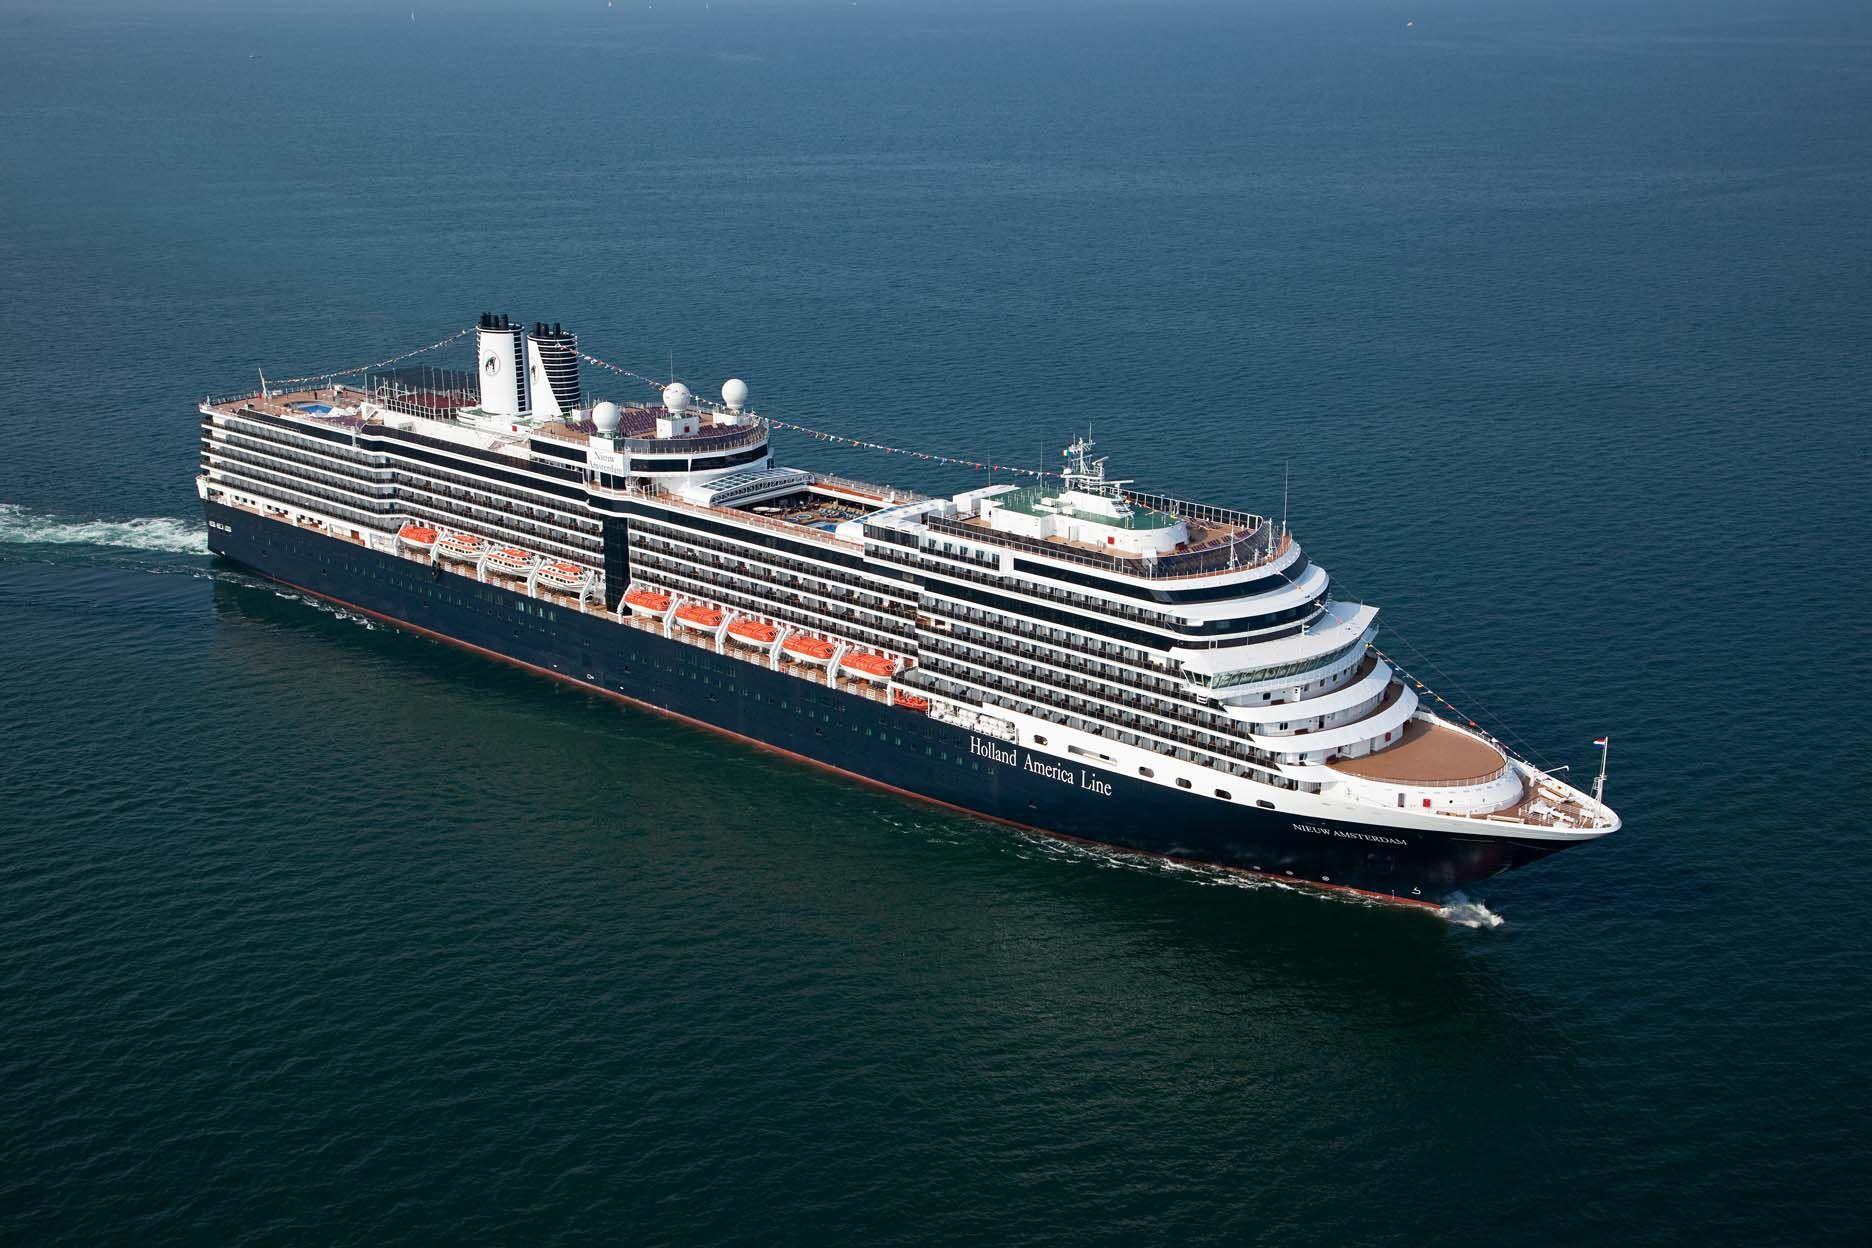 Holland Cruise